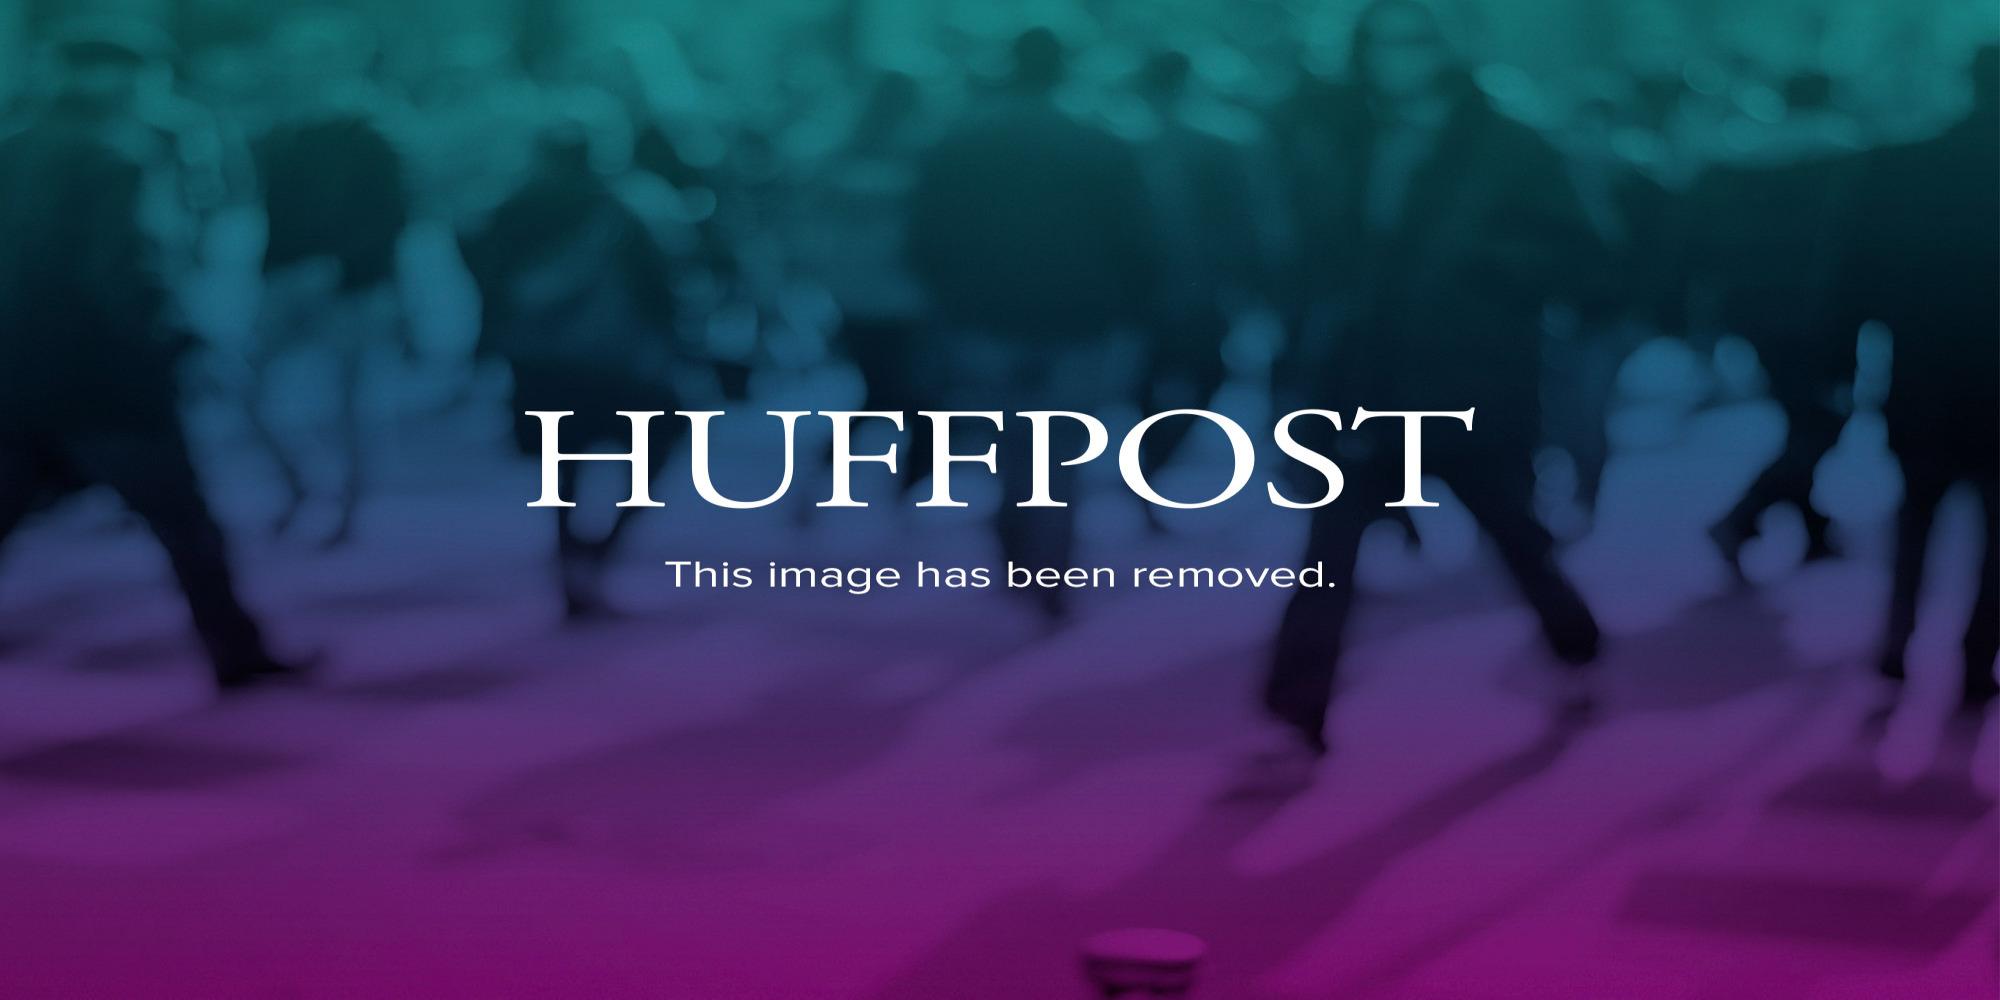 http://i.huffpost.com/gen/1166405/thumbs/o-US-CONSUMER-SPENDING-facebook.jpg